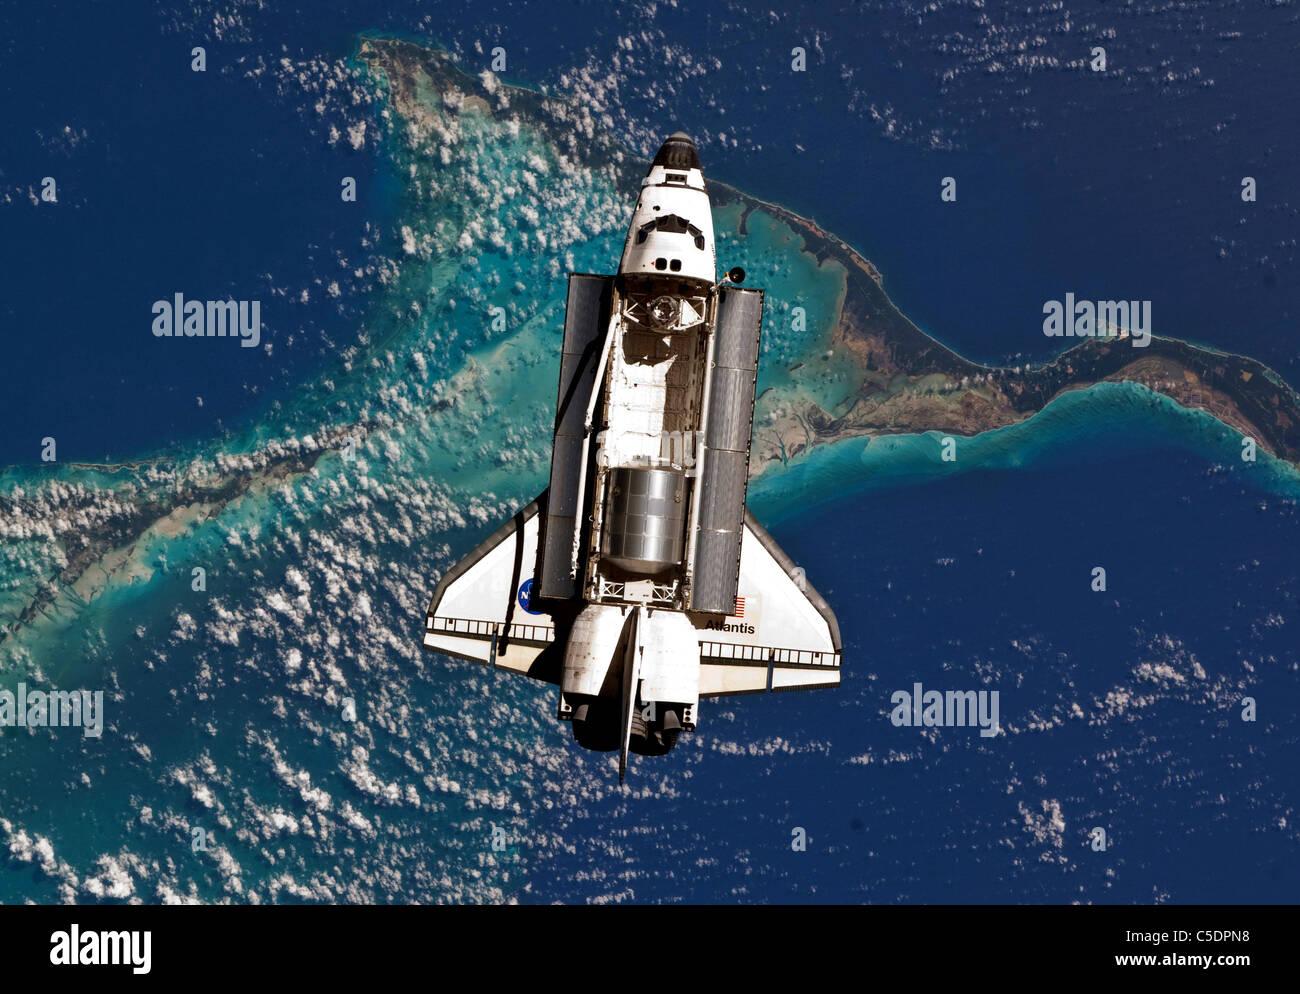 Space Shuttle Atlantis Atlantis Stock Photos & Space ...